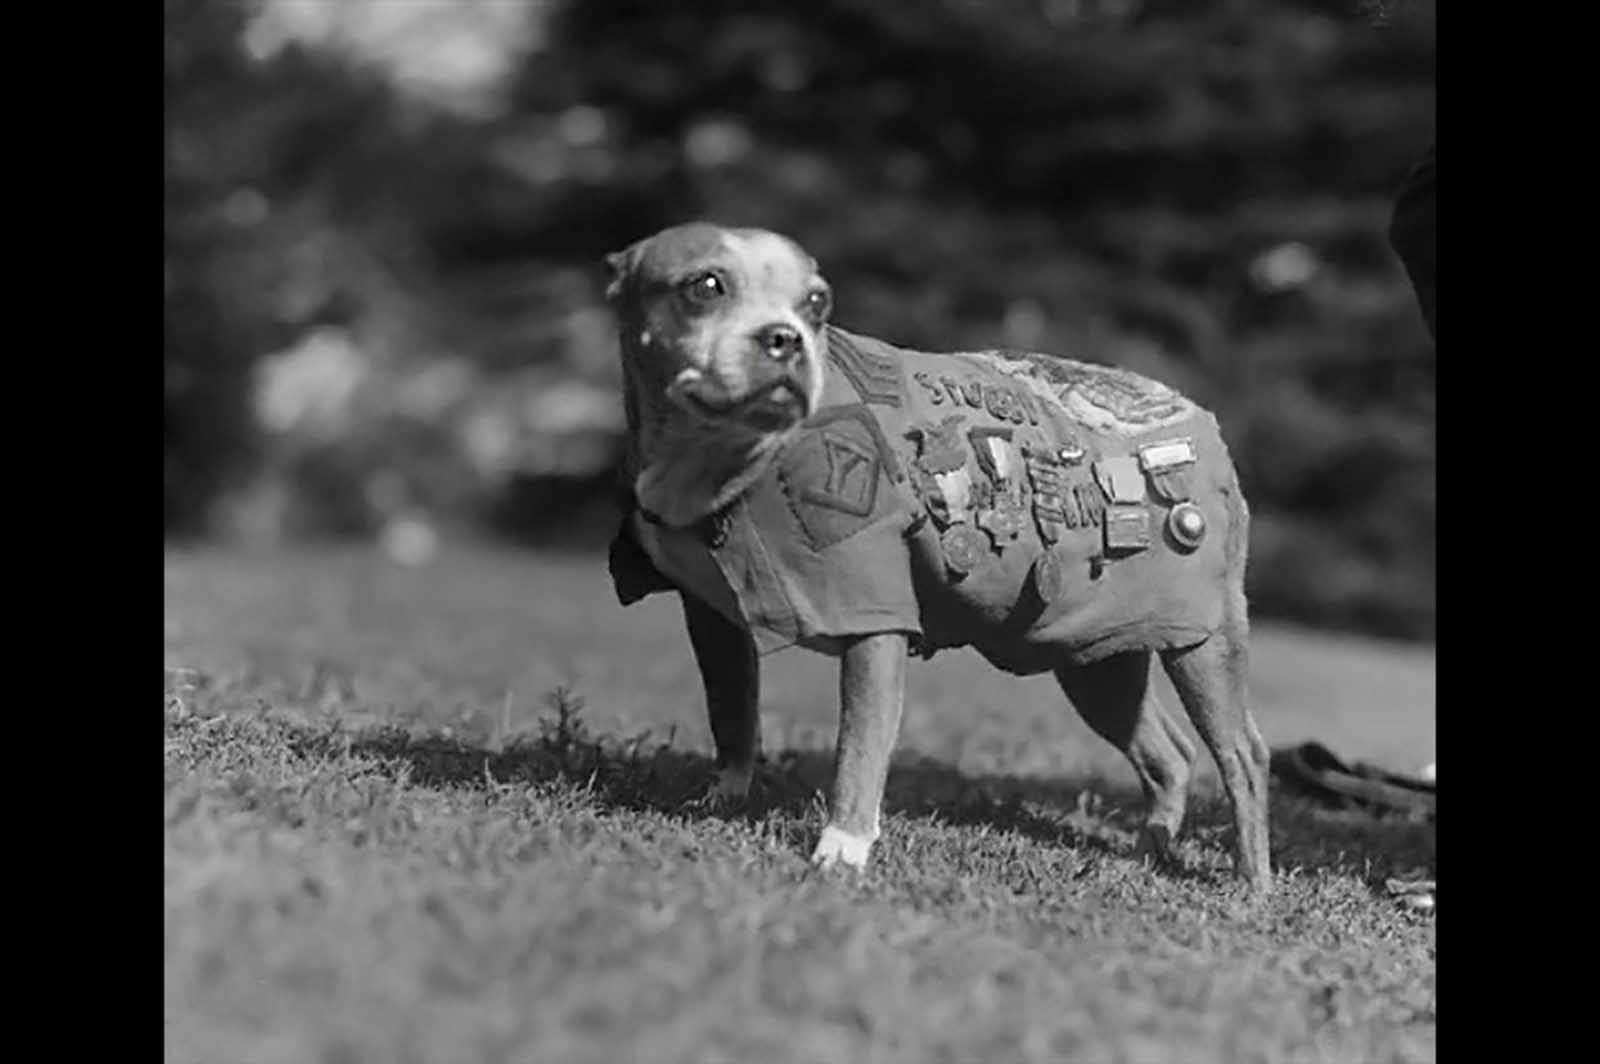 Seržant Stubby